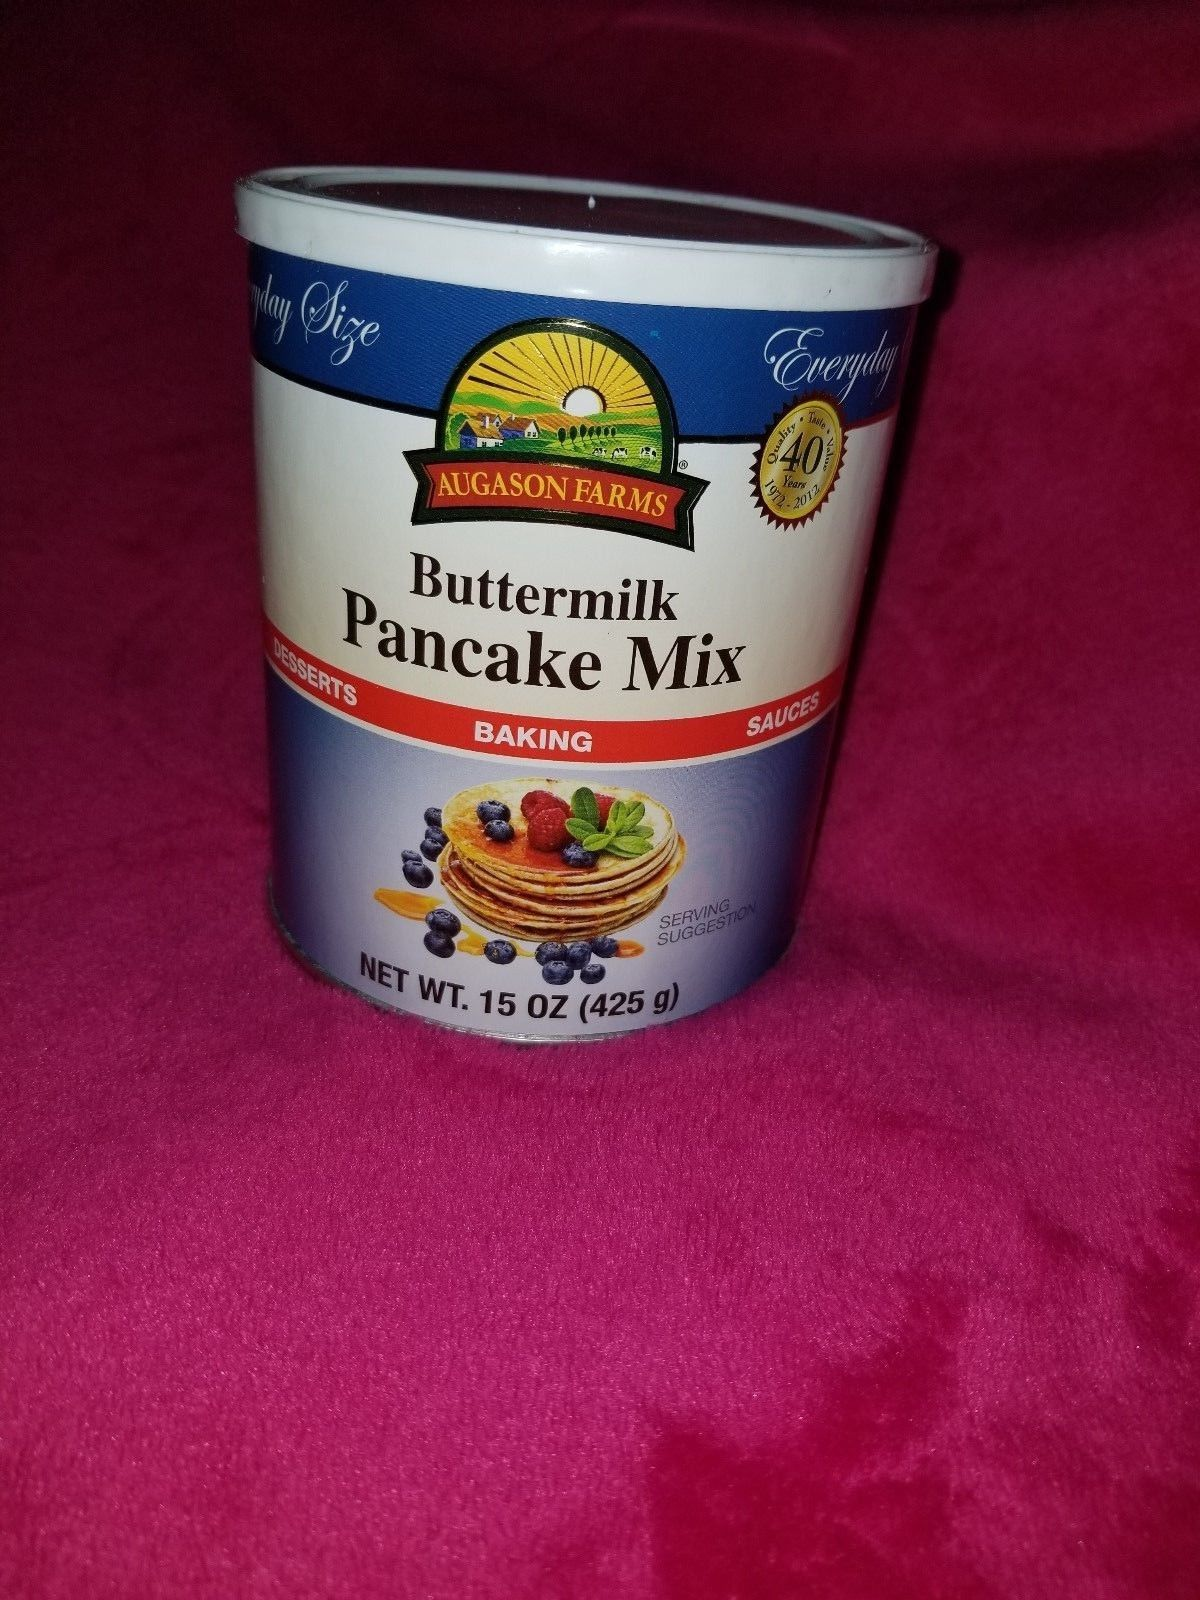 Augason Farms Buttermilk Pancake Mix Emergency Food Storage Survival Prepper 1